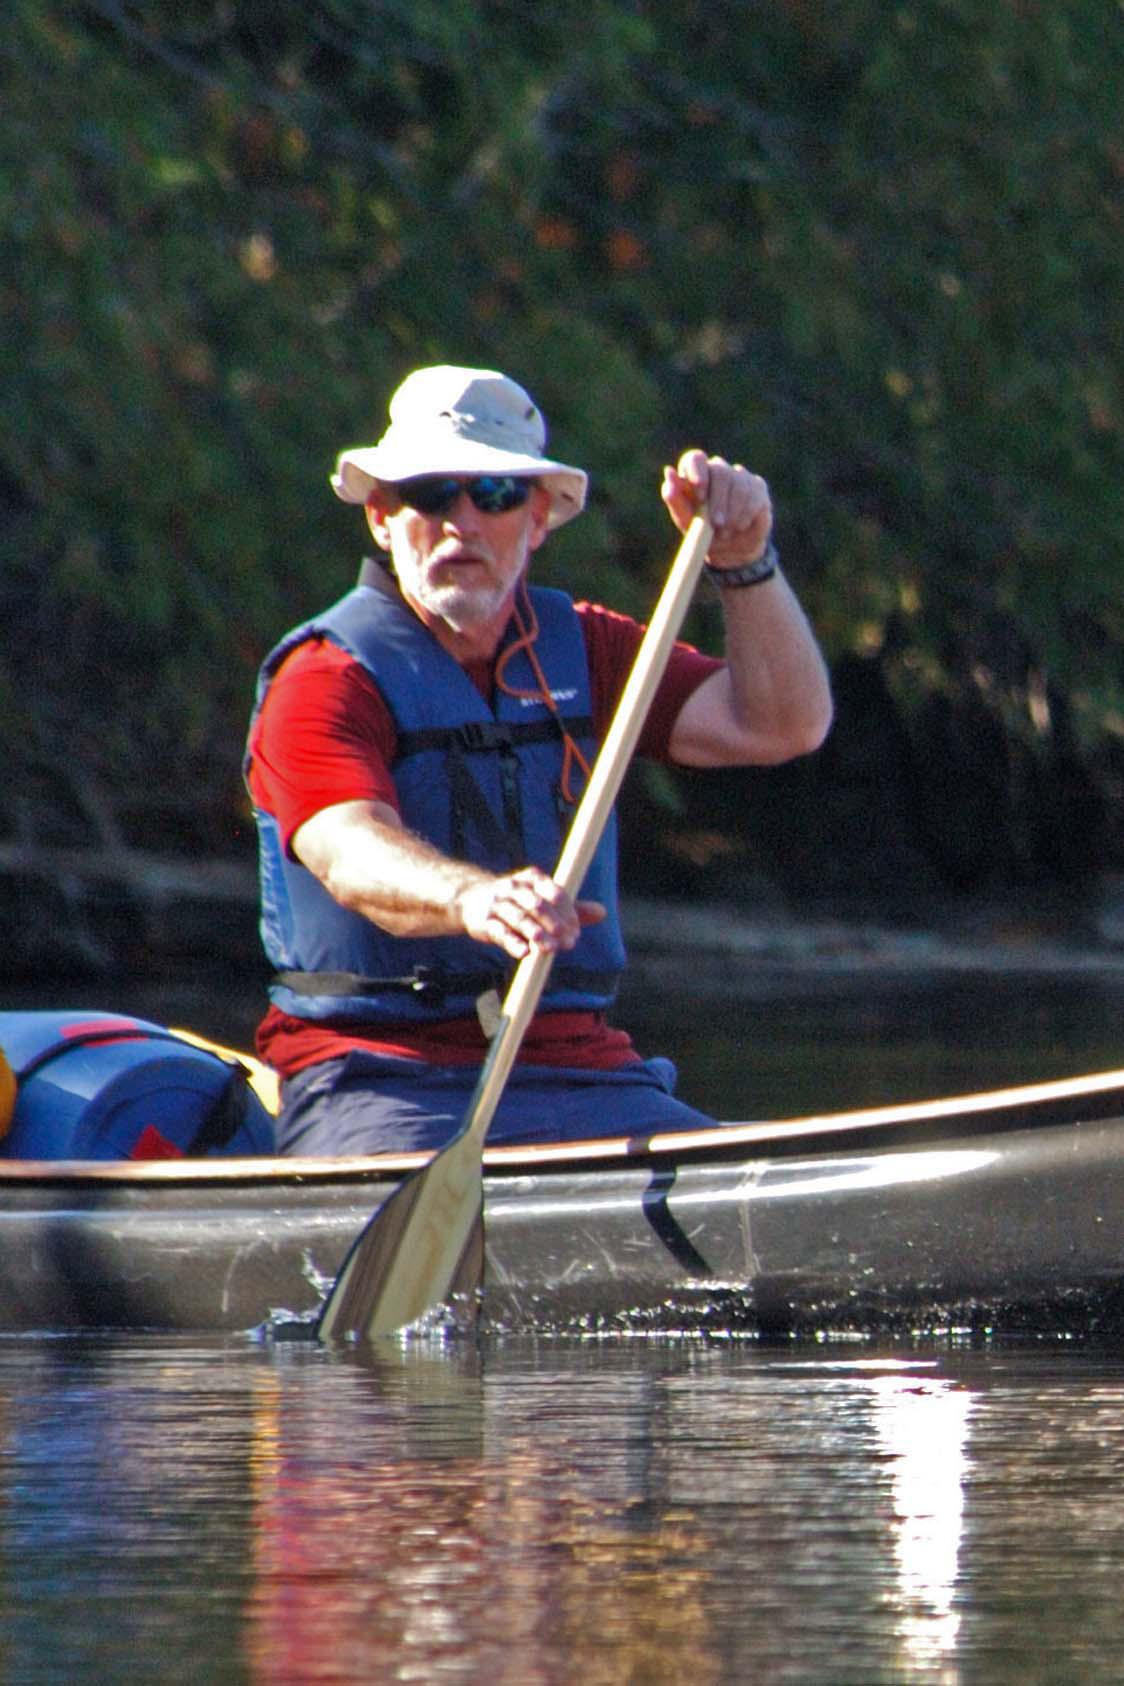 Rob canoeing the BWCA | Photo courtesy of Rob Kesselring